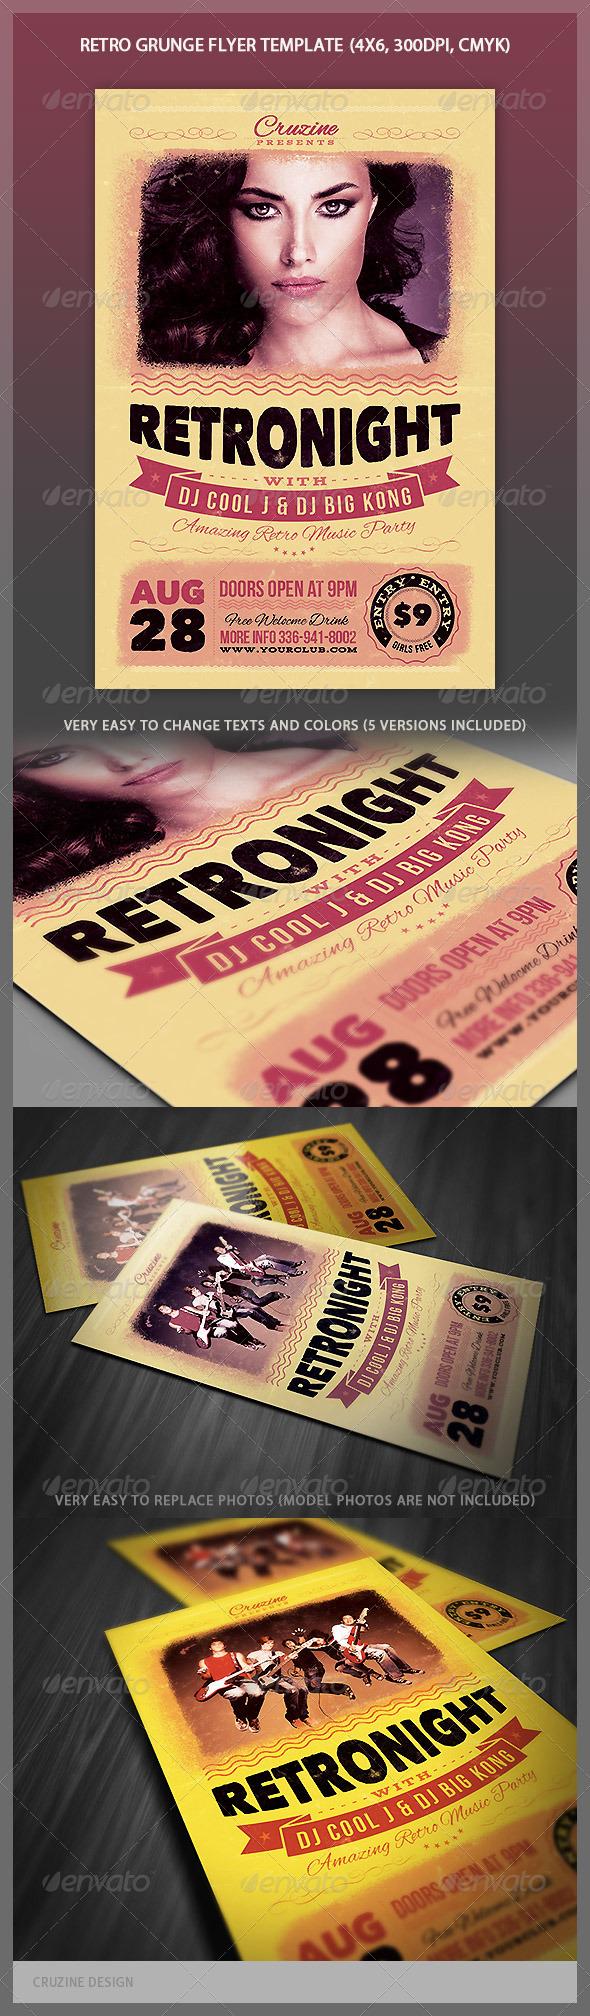 Retro Grunge Flyer - Events Flyers